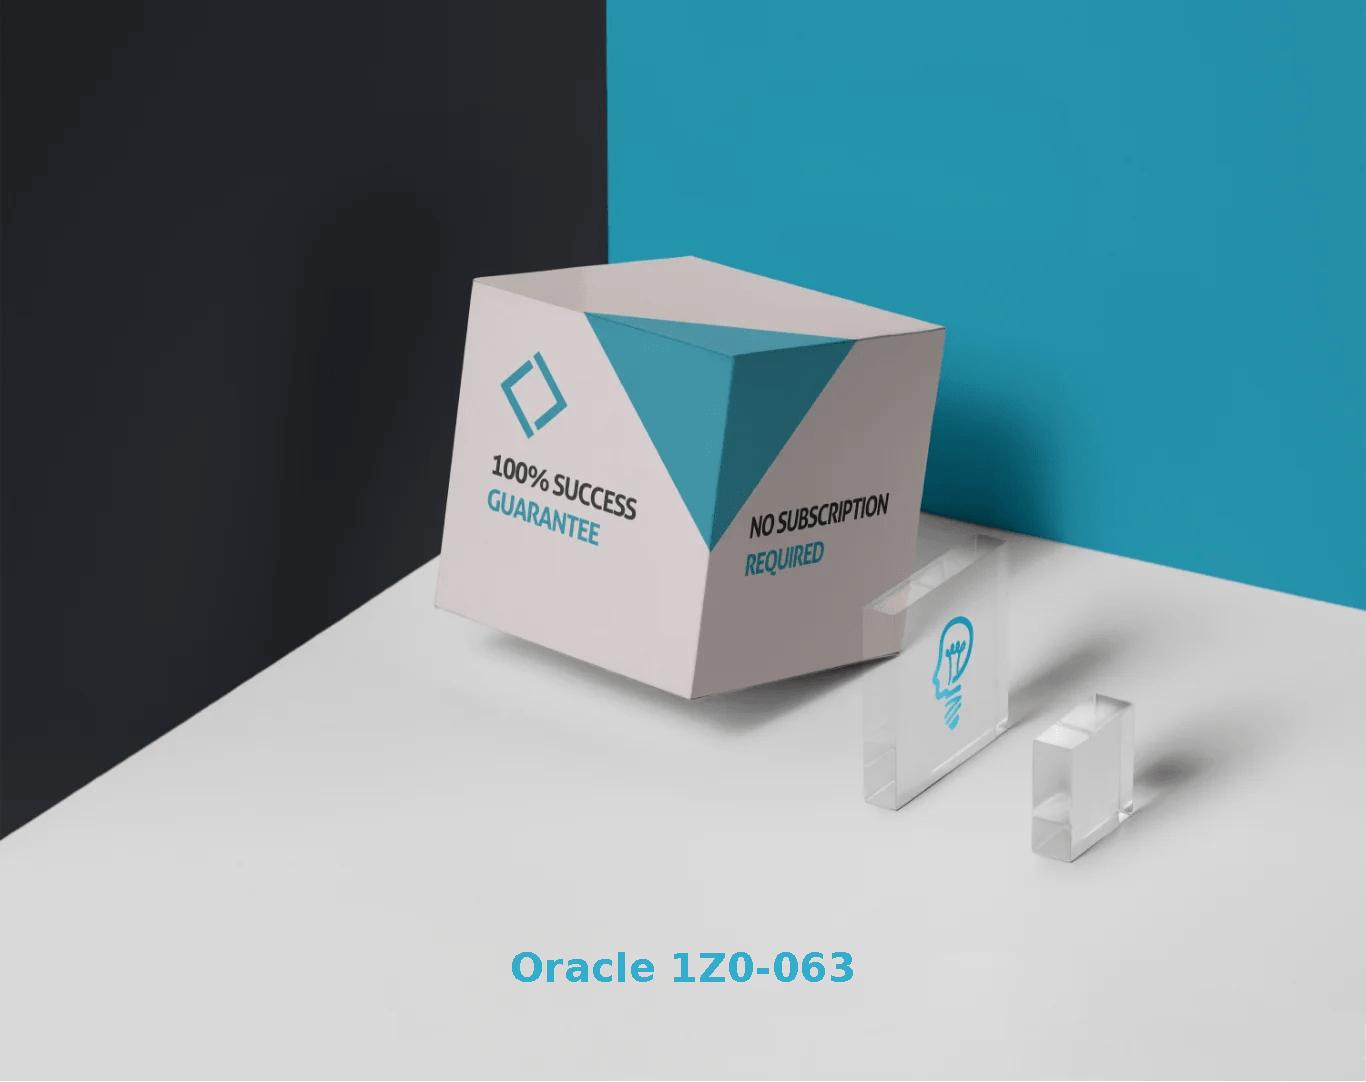 Oracle 1Z0-063 Exams